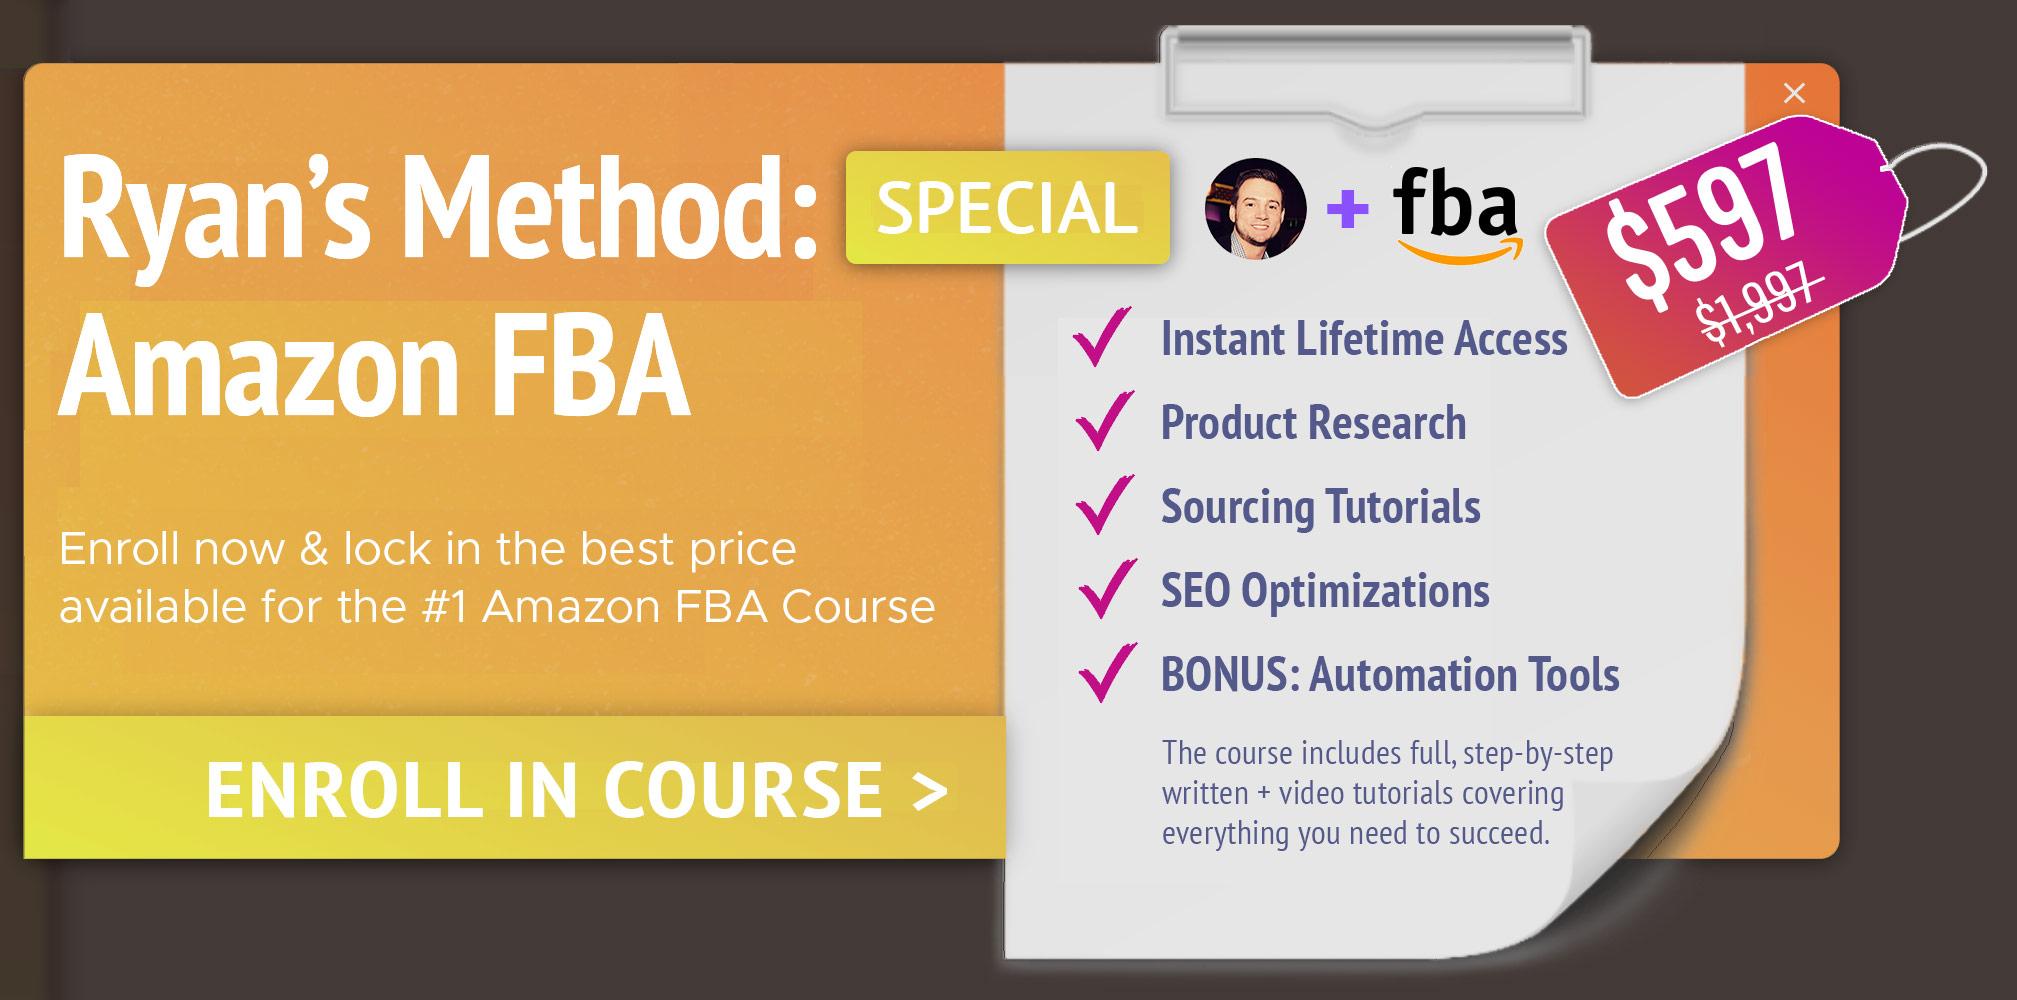 Enroll in Ryans Method: Amazon FBA